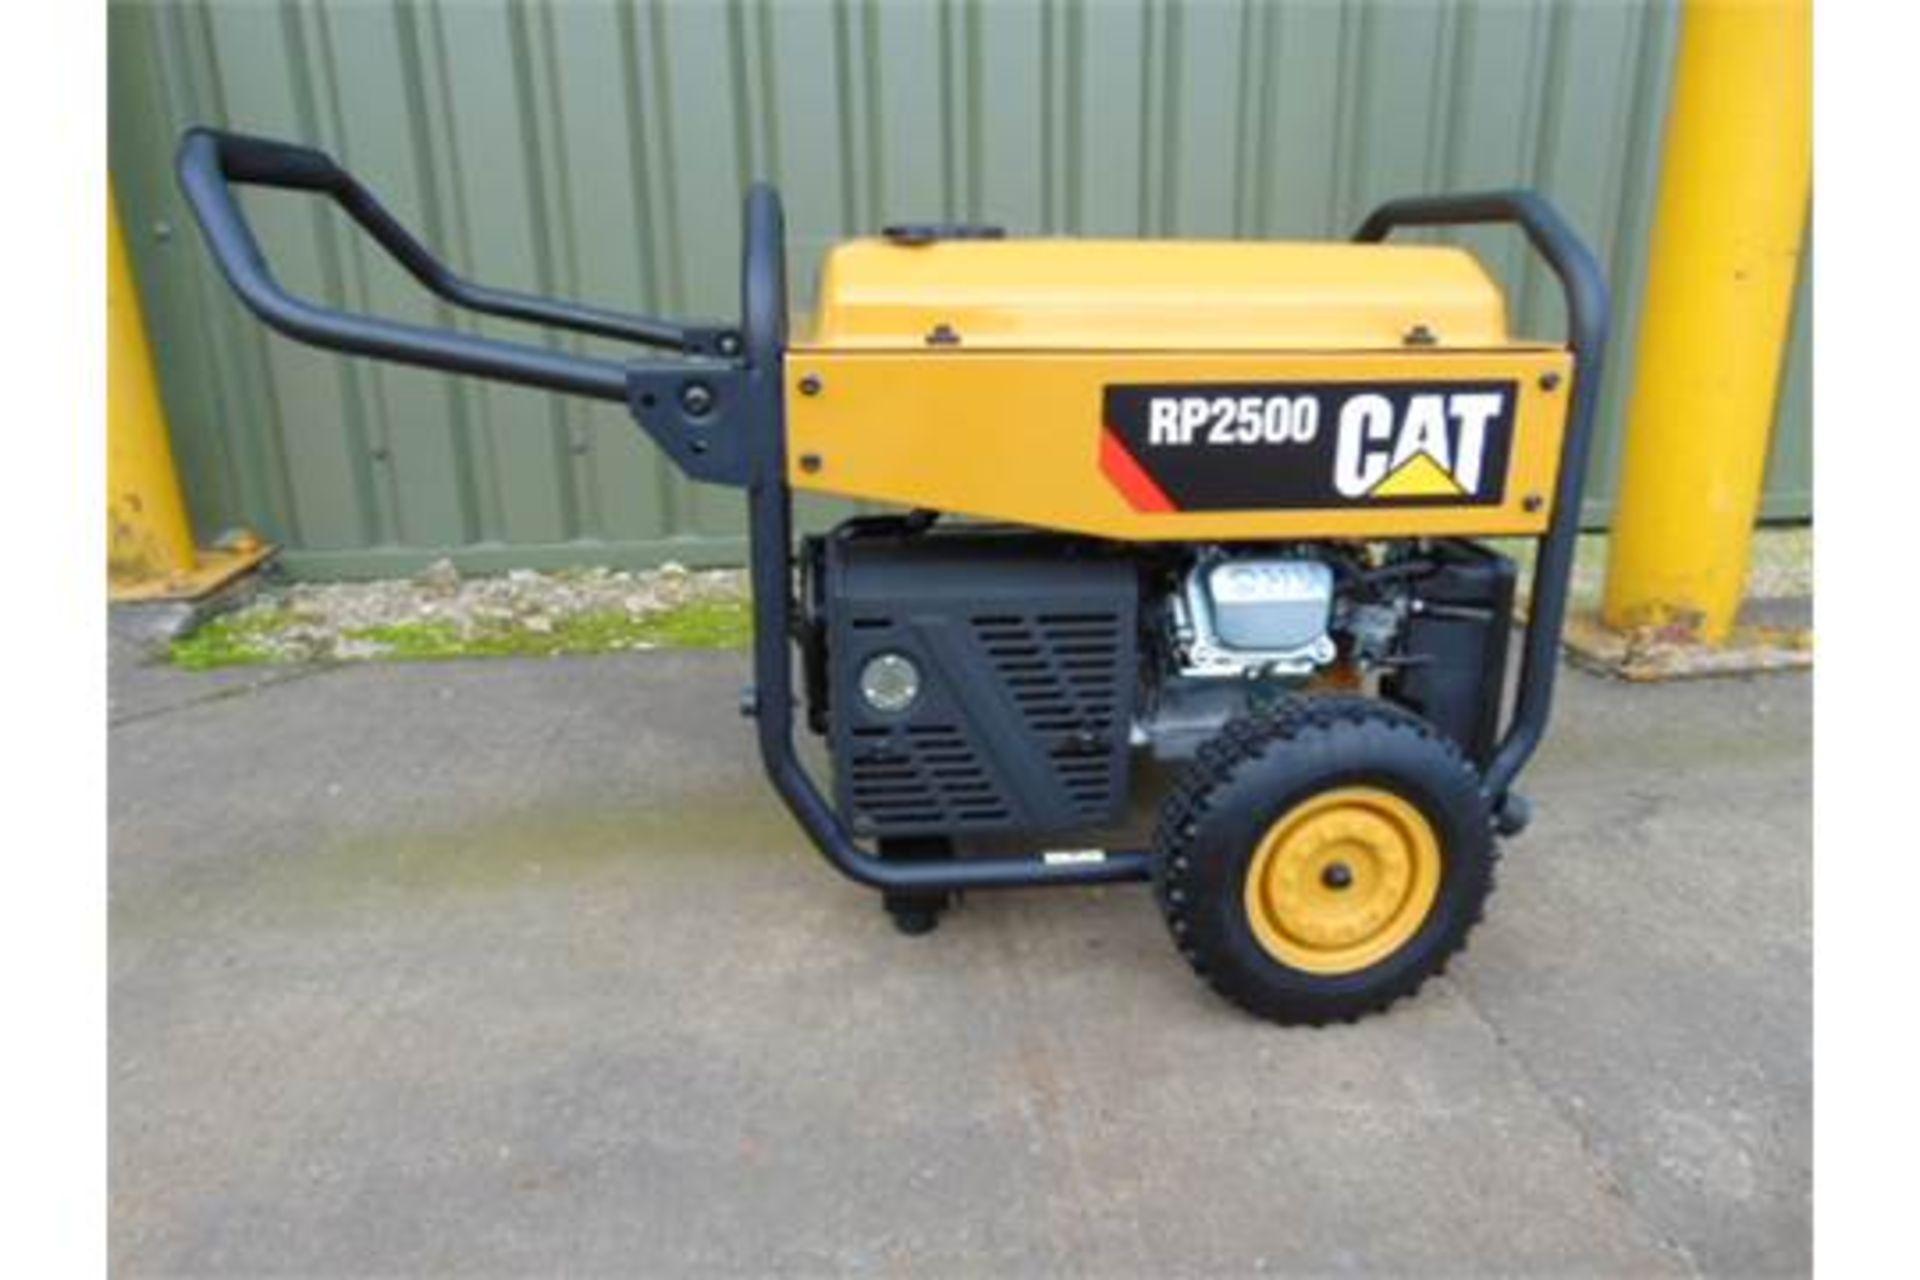 Lot 90 - UNISSUED Caterpillar RP2500 Industrial Petrol Generator Set